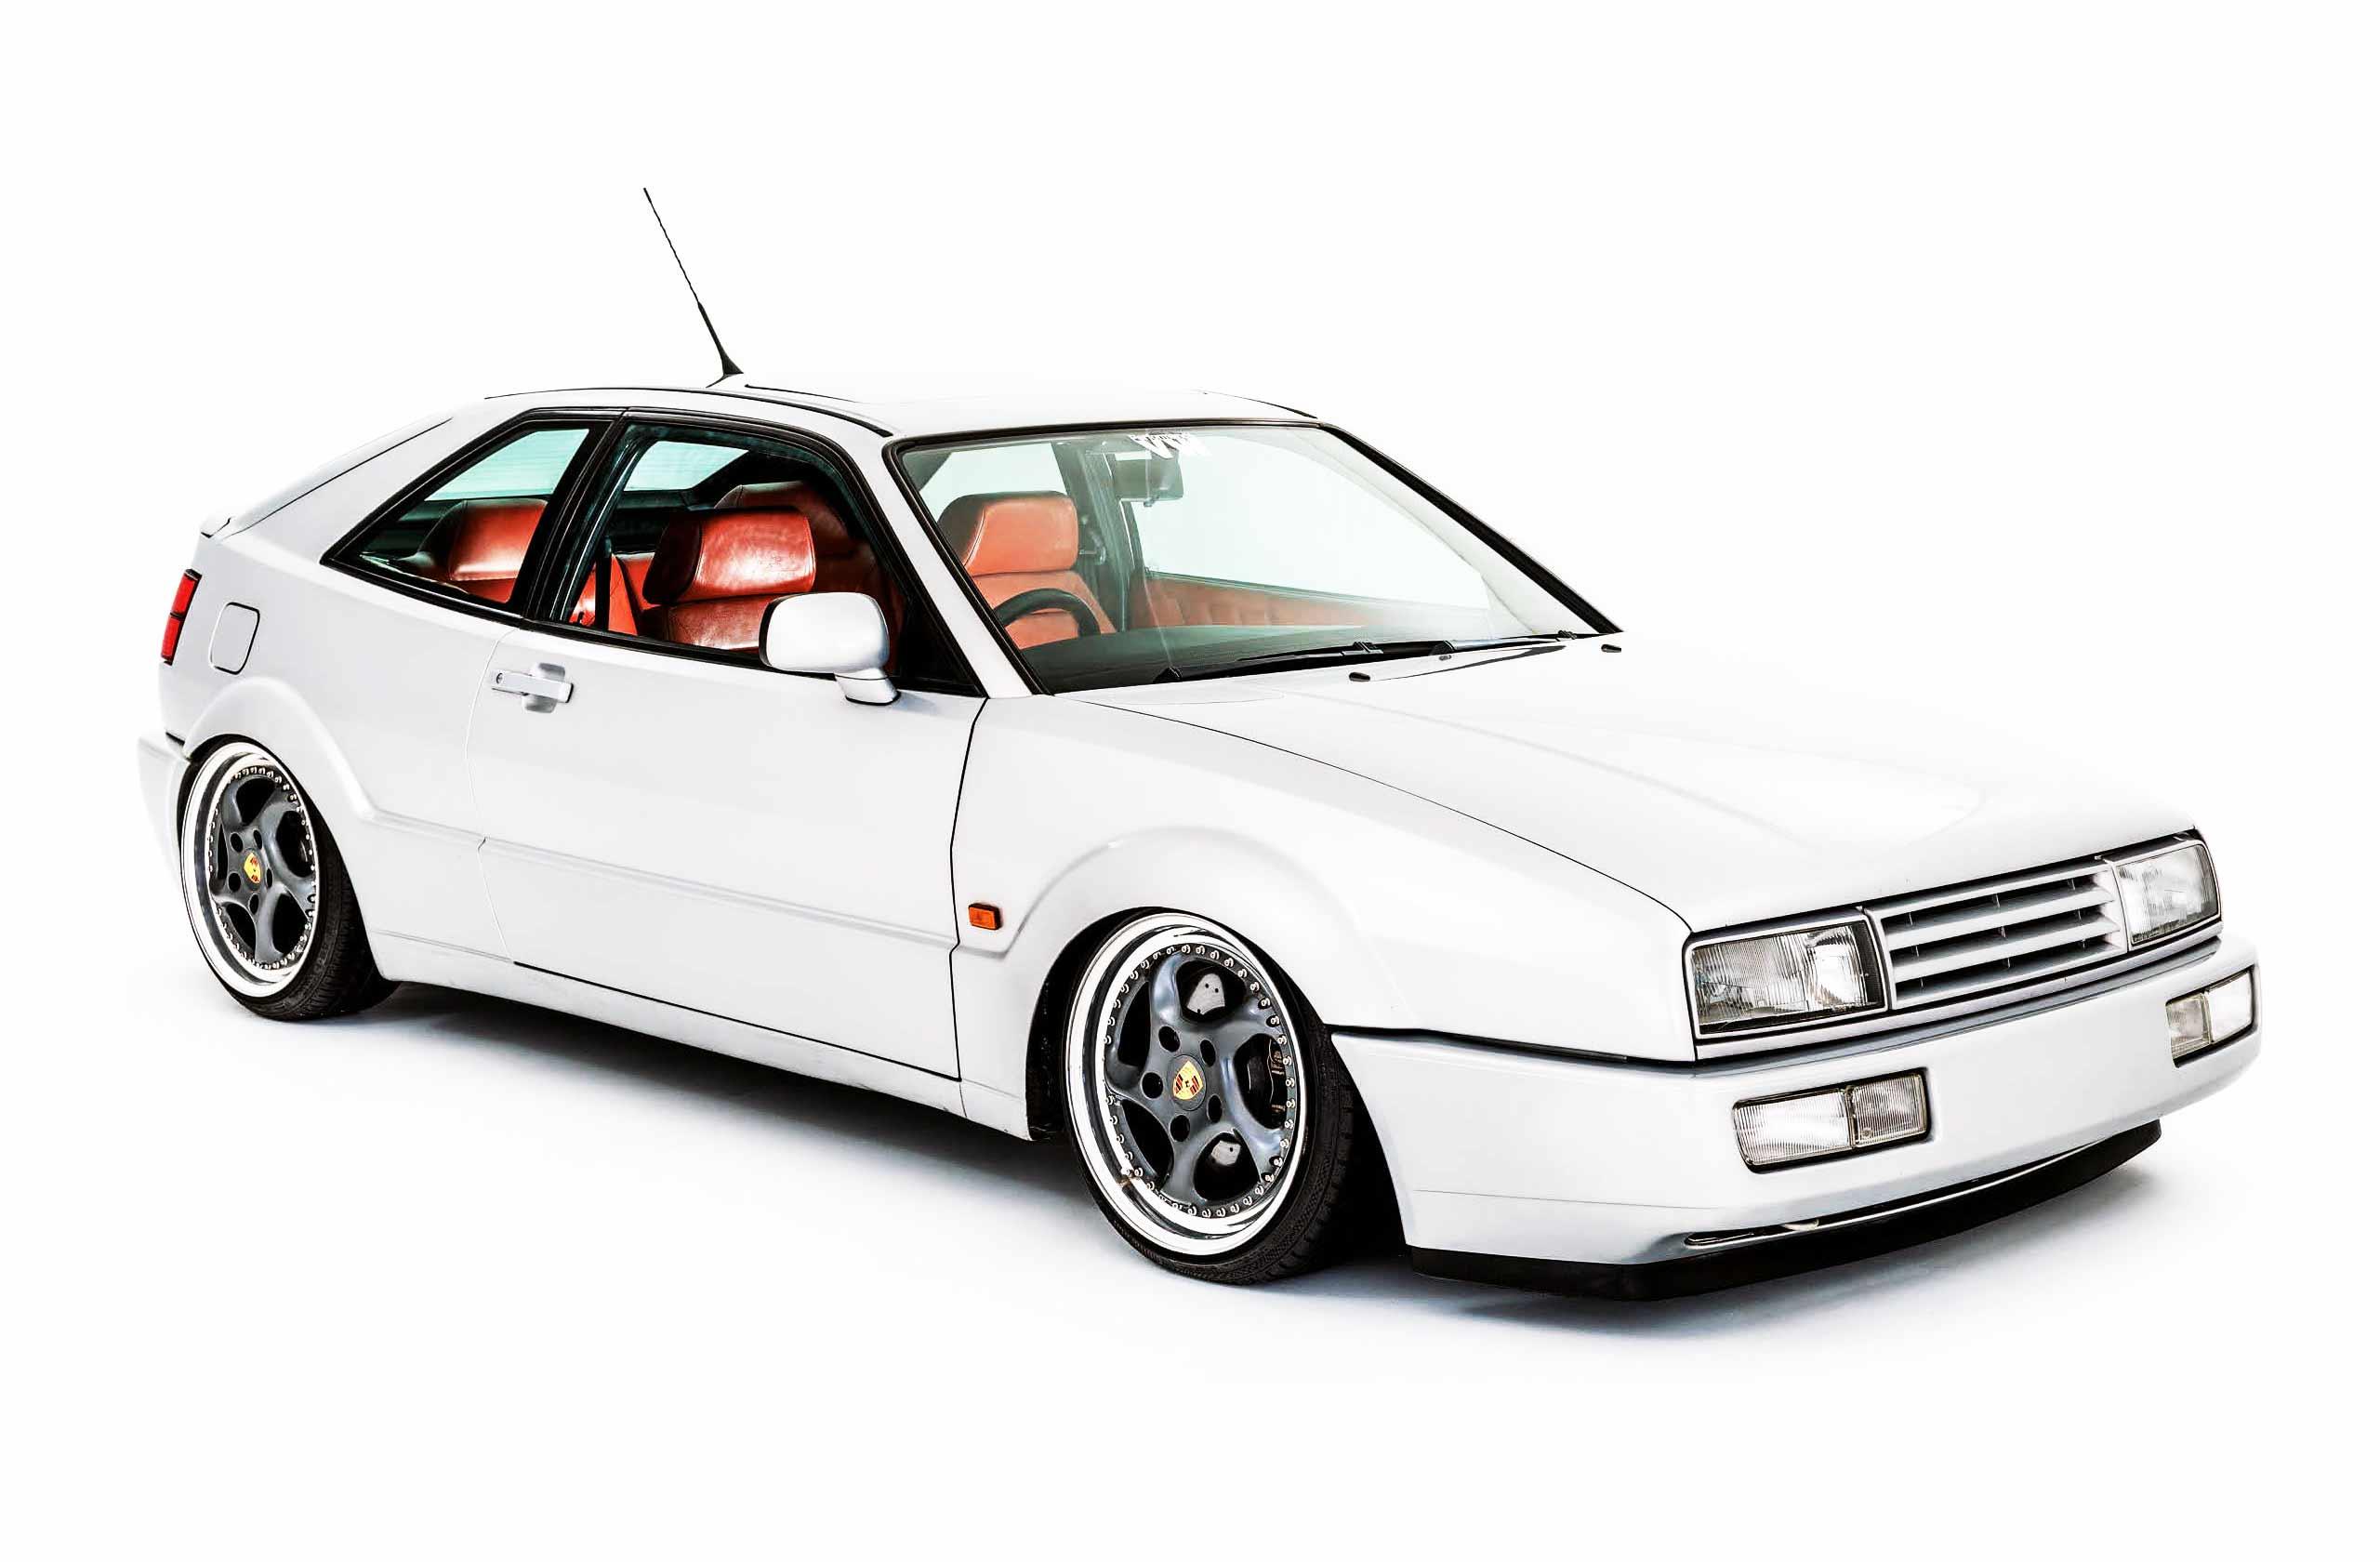 Bagged Vw Corrado 1 8t 300bhp Bam Engined